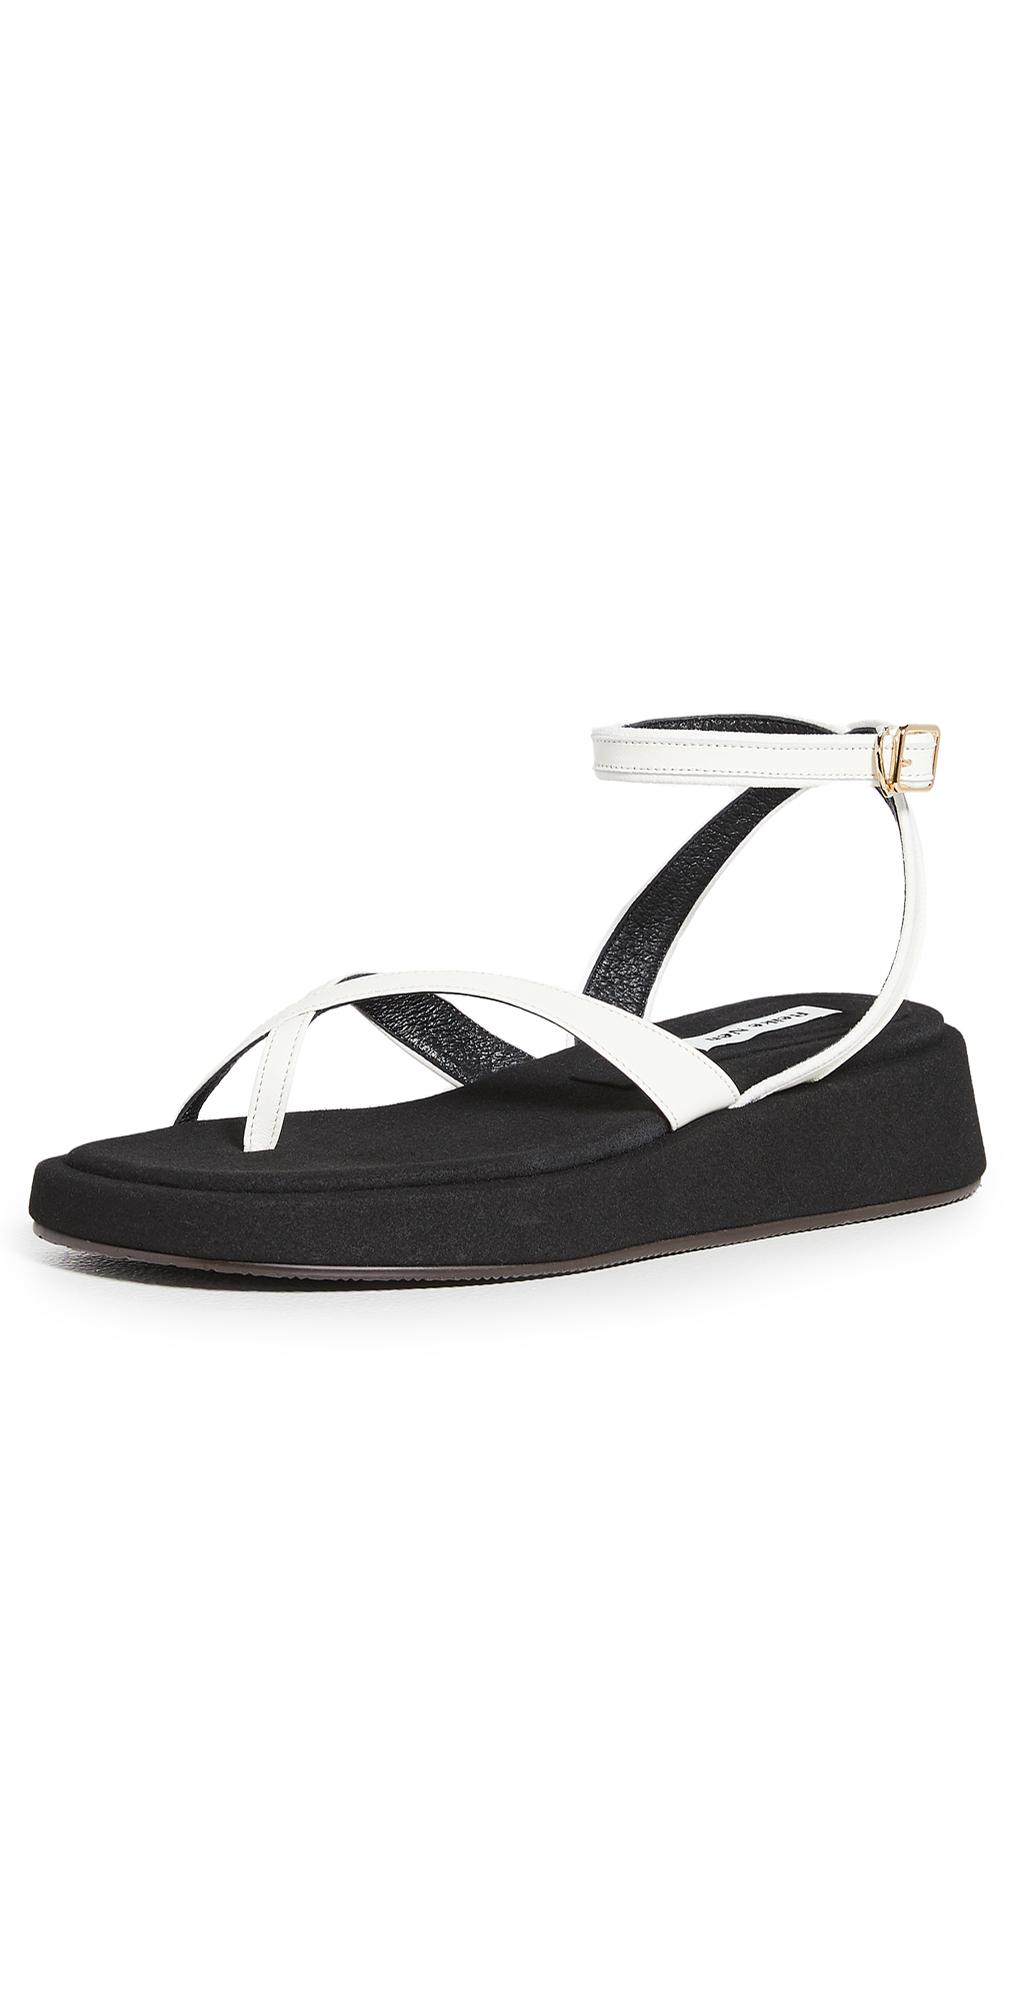 Reike Nen X Ankle Strap Platform Sandals